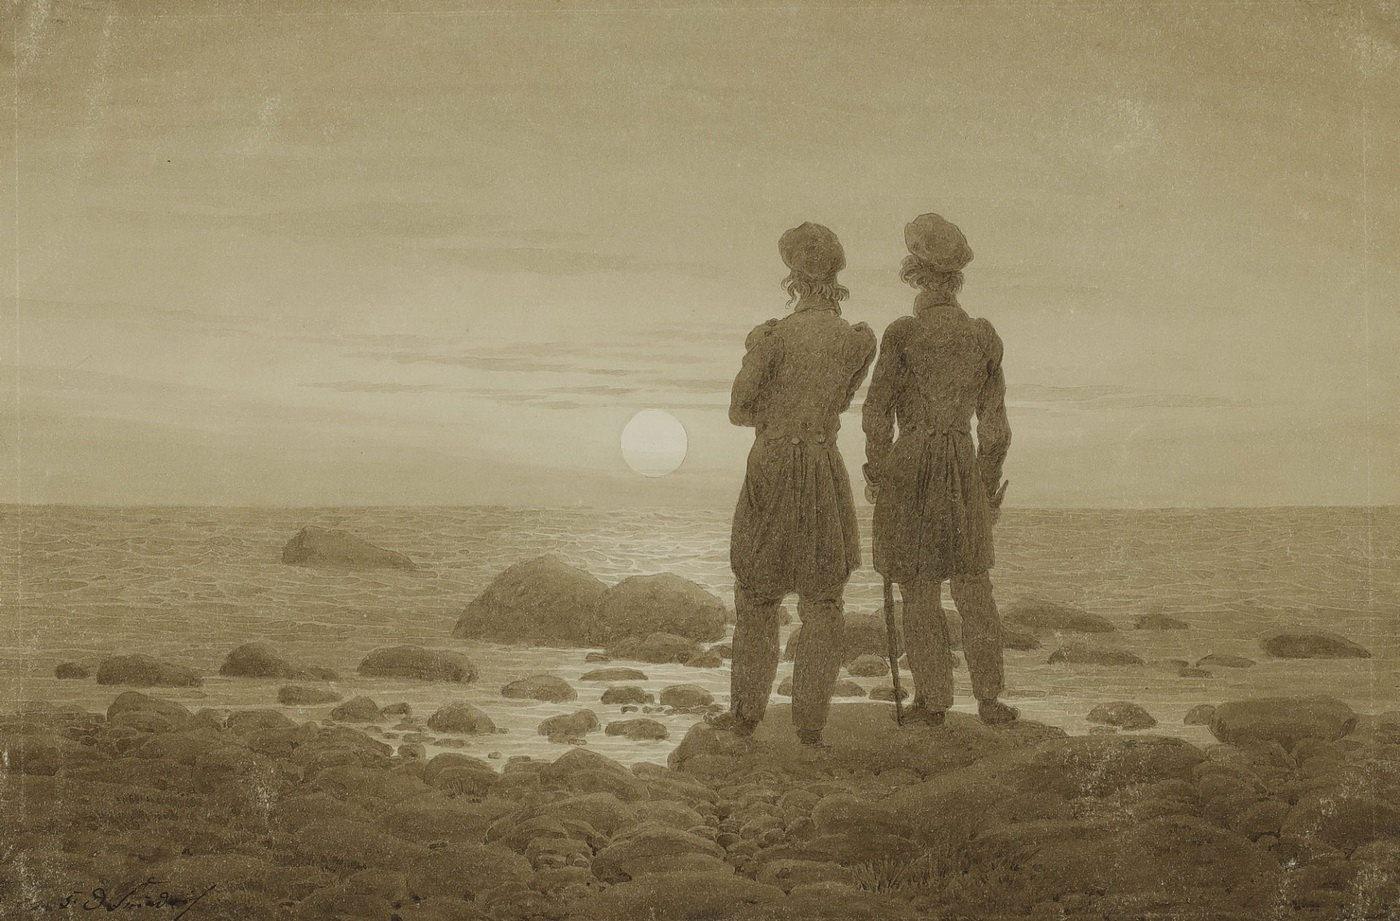 Фридрих Каспар Давид К. Двое мужчин на берегу моря. 1830-1835. ГМИИ им. А.С. Пушкина